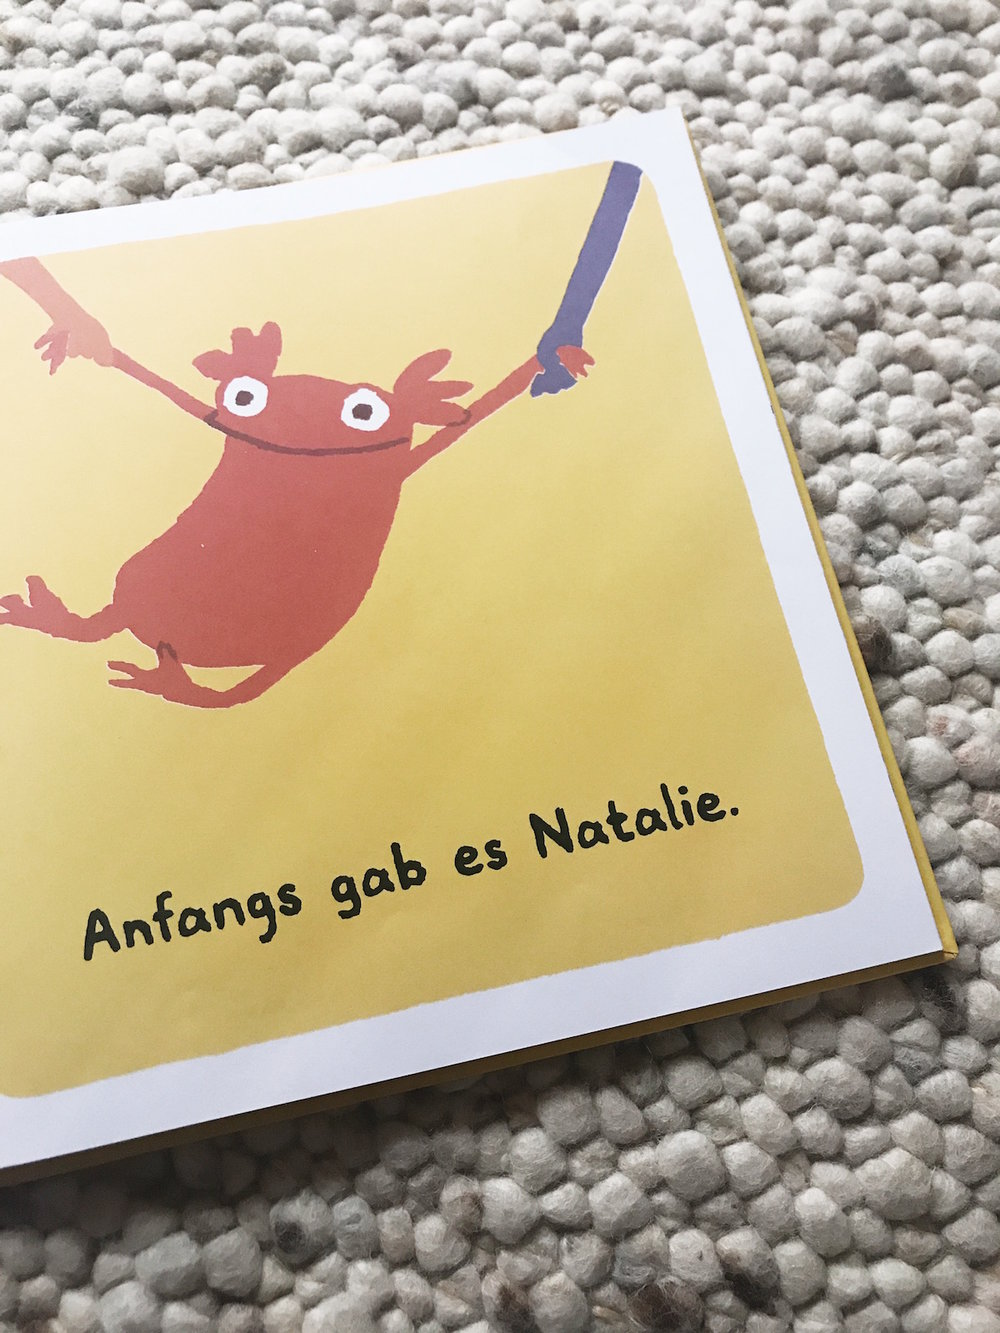 Anfangs gibt es Natalie, dann kam Alfonso dazu.